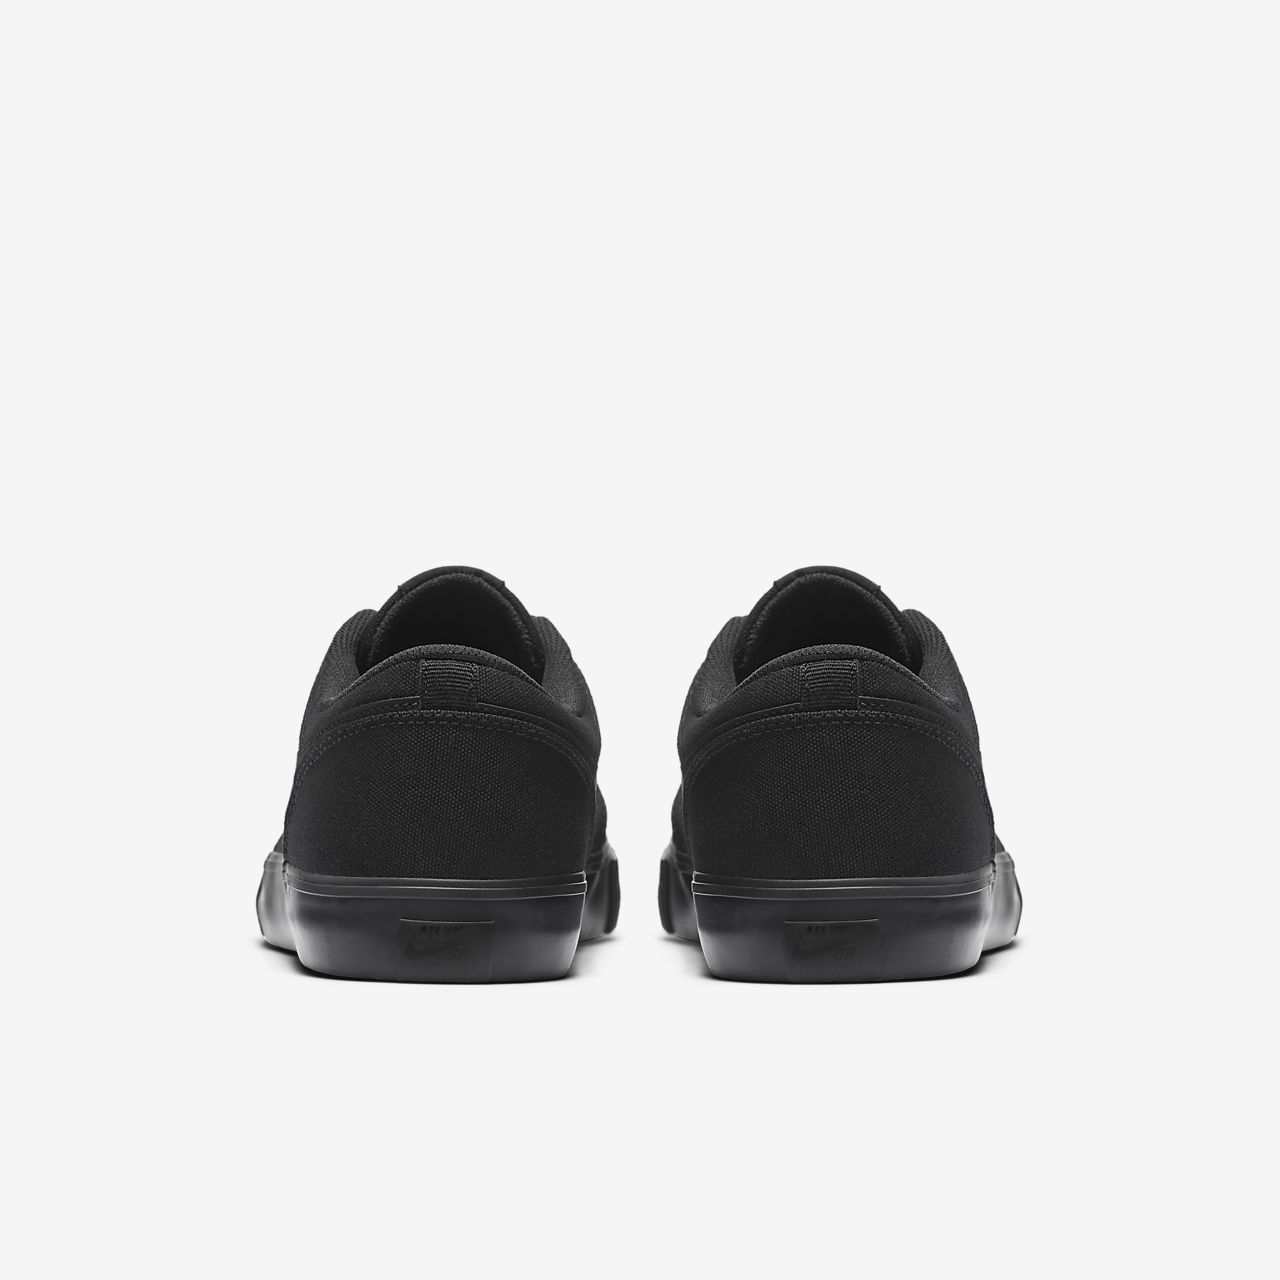 Sapatilhas de skateboard Nike SB Solarsoft Portmore 2